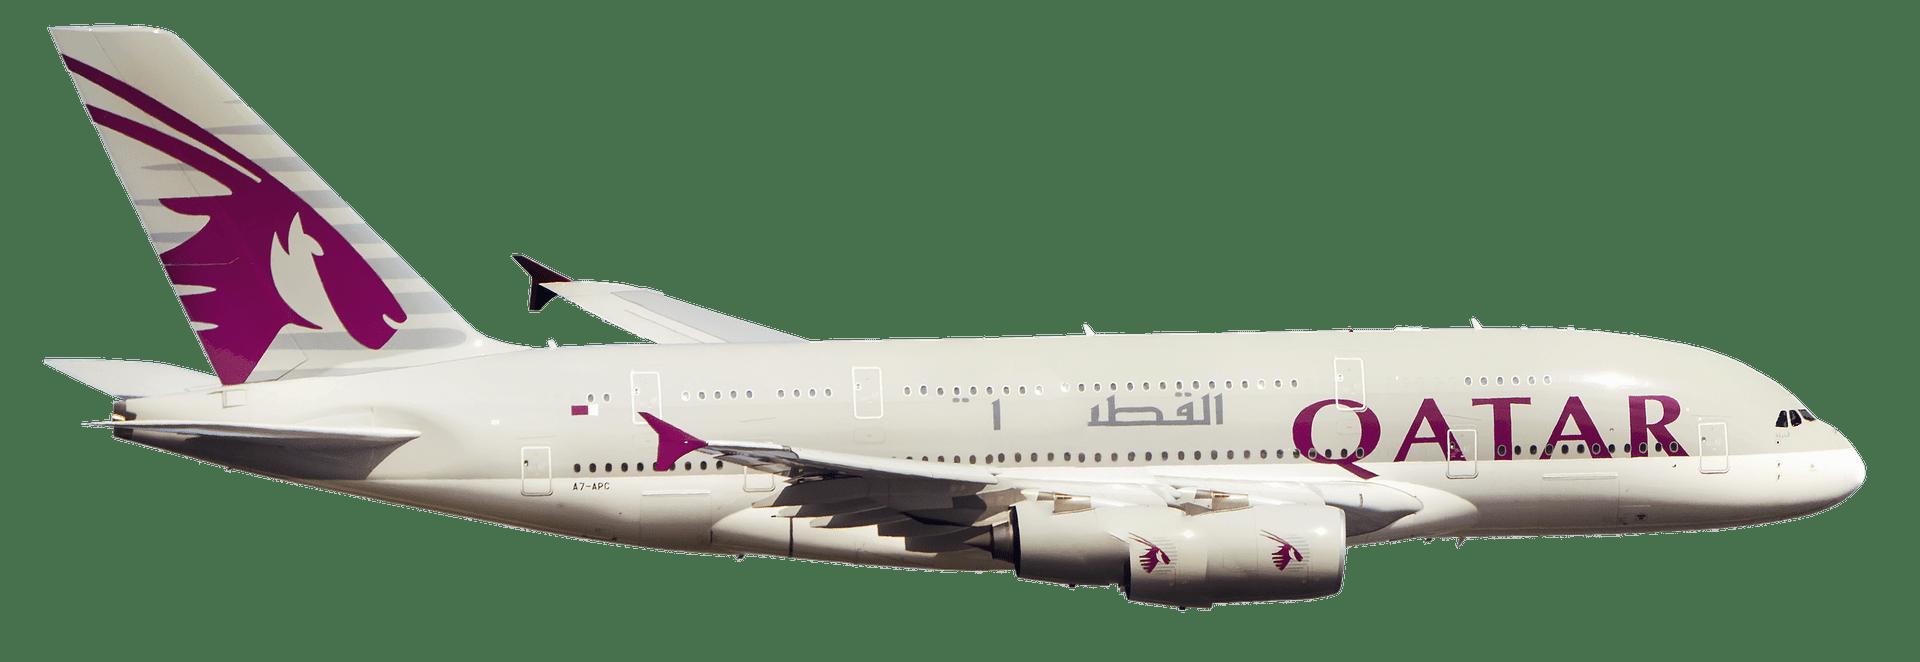 Book Qatar Airways Business Class Flights from london uk